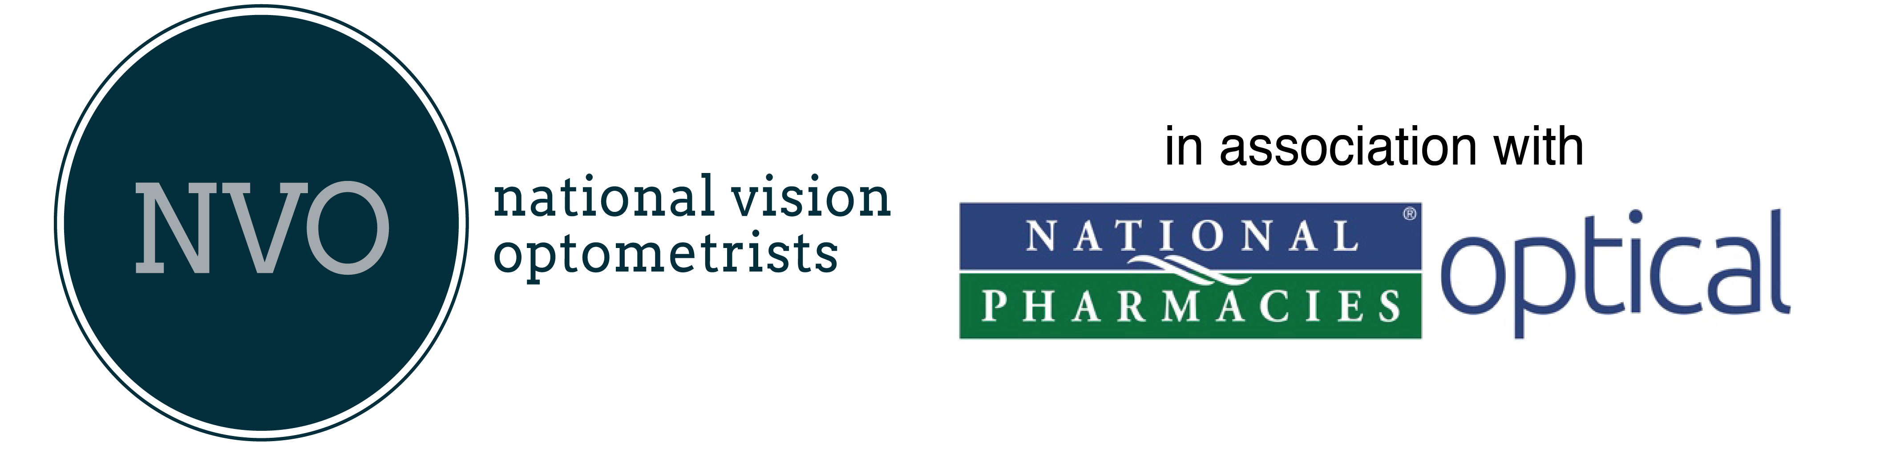 logo for National Vision Optometrists - Golden Grove Optometrists